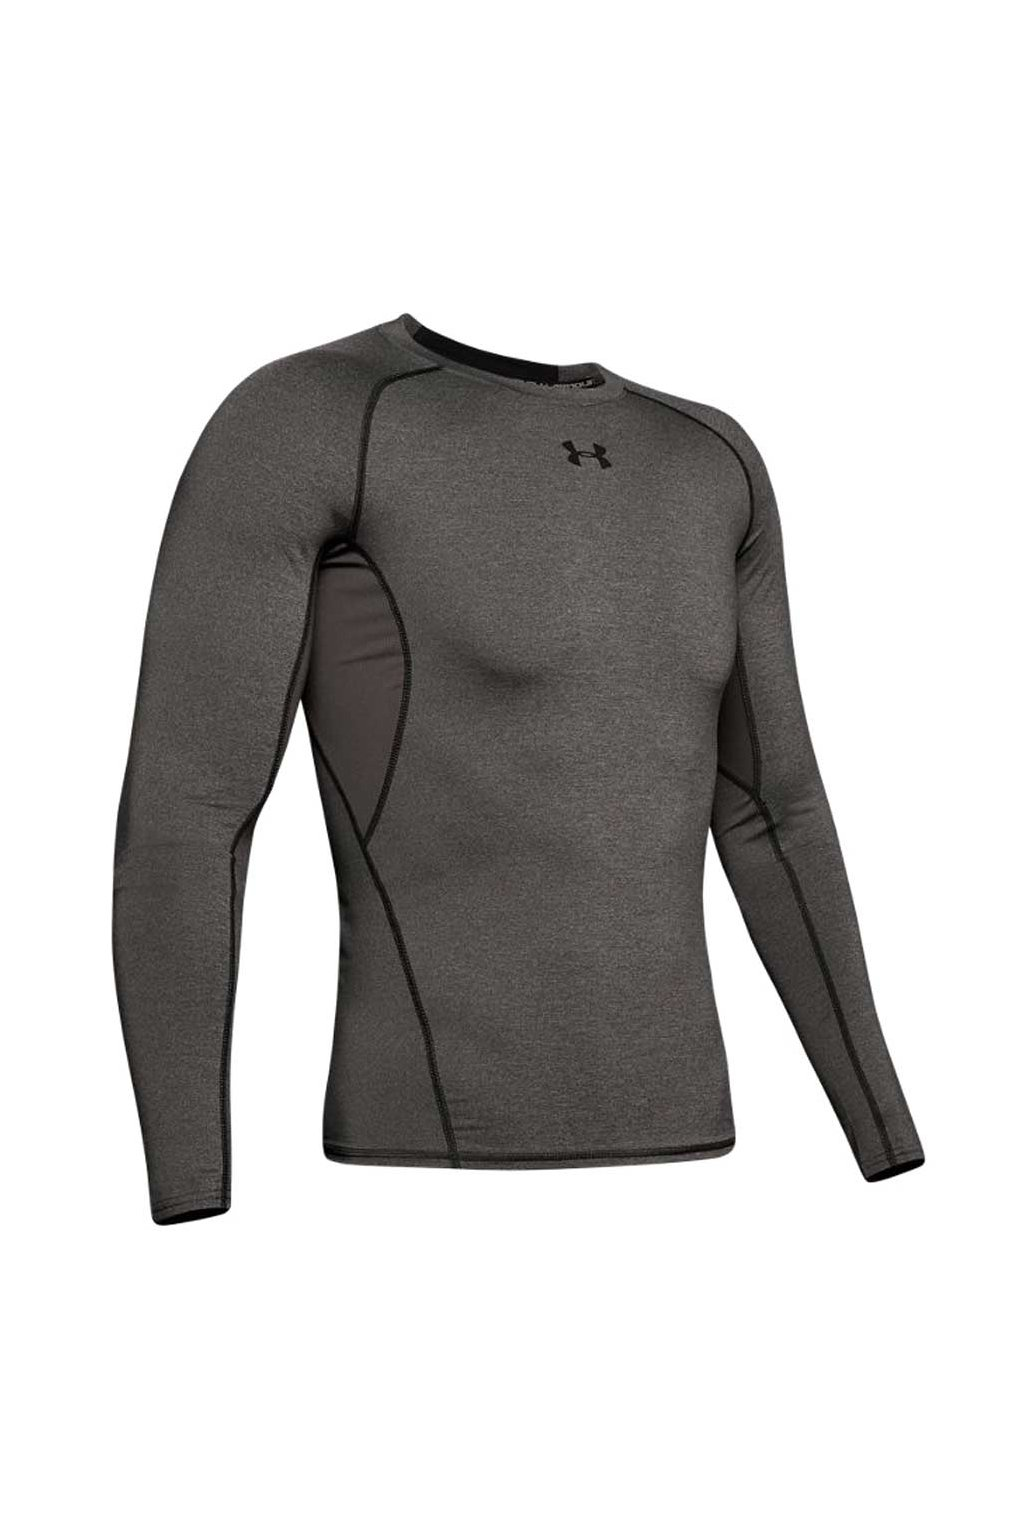 Pánske tričko Under Armour Hg Ls sivé 1257471 090